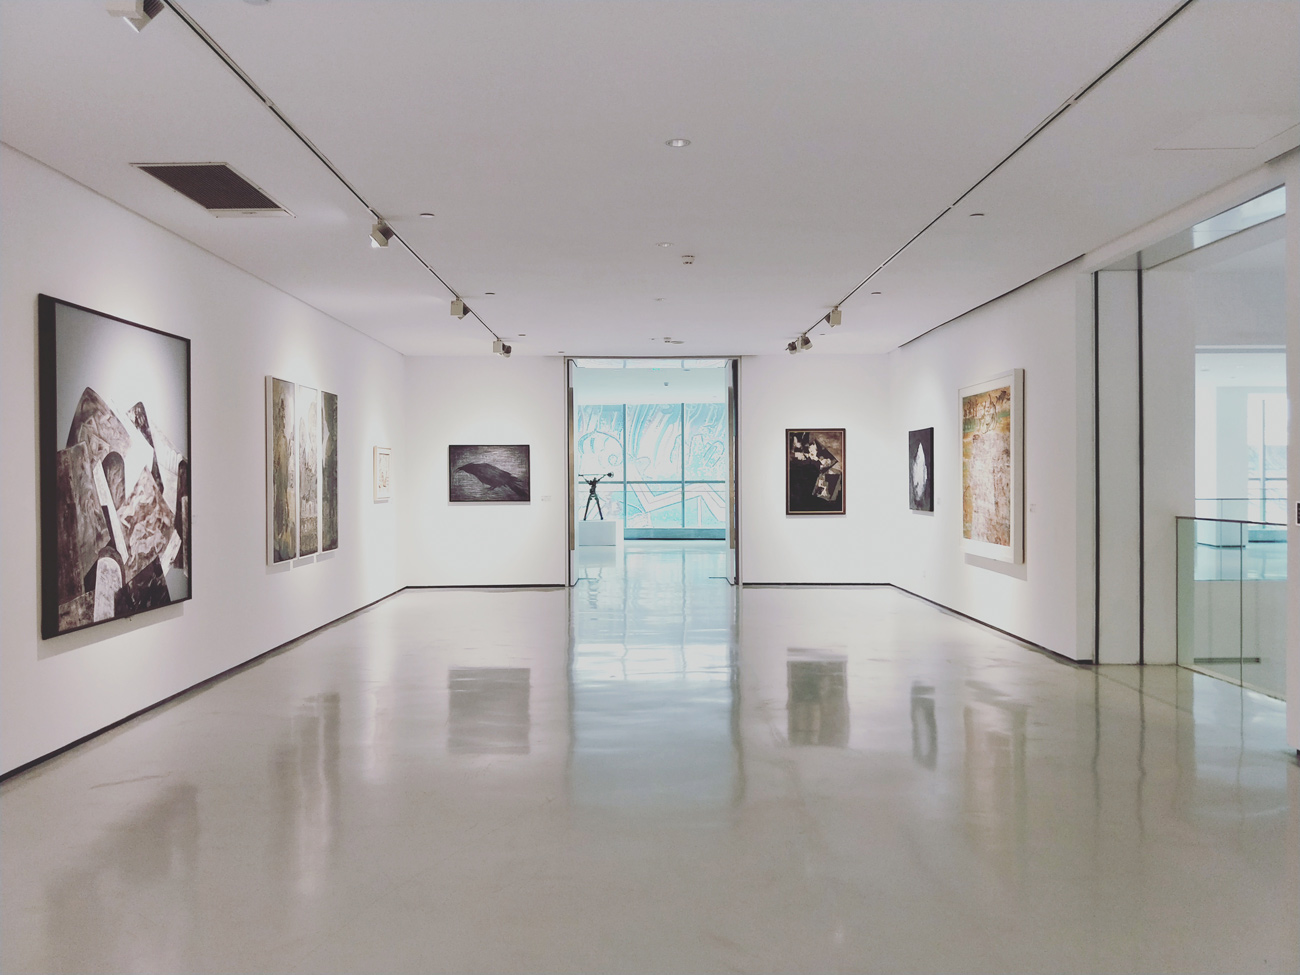 🖼️ Mykolaїvśkyj hudožnij muzej ocyfruvav ponad 500 eksponativ